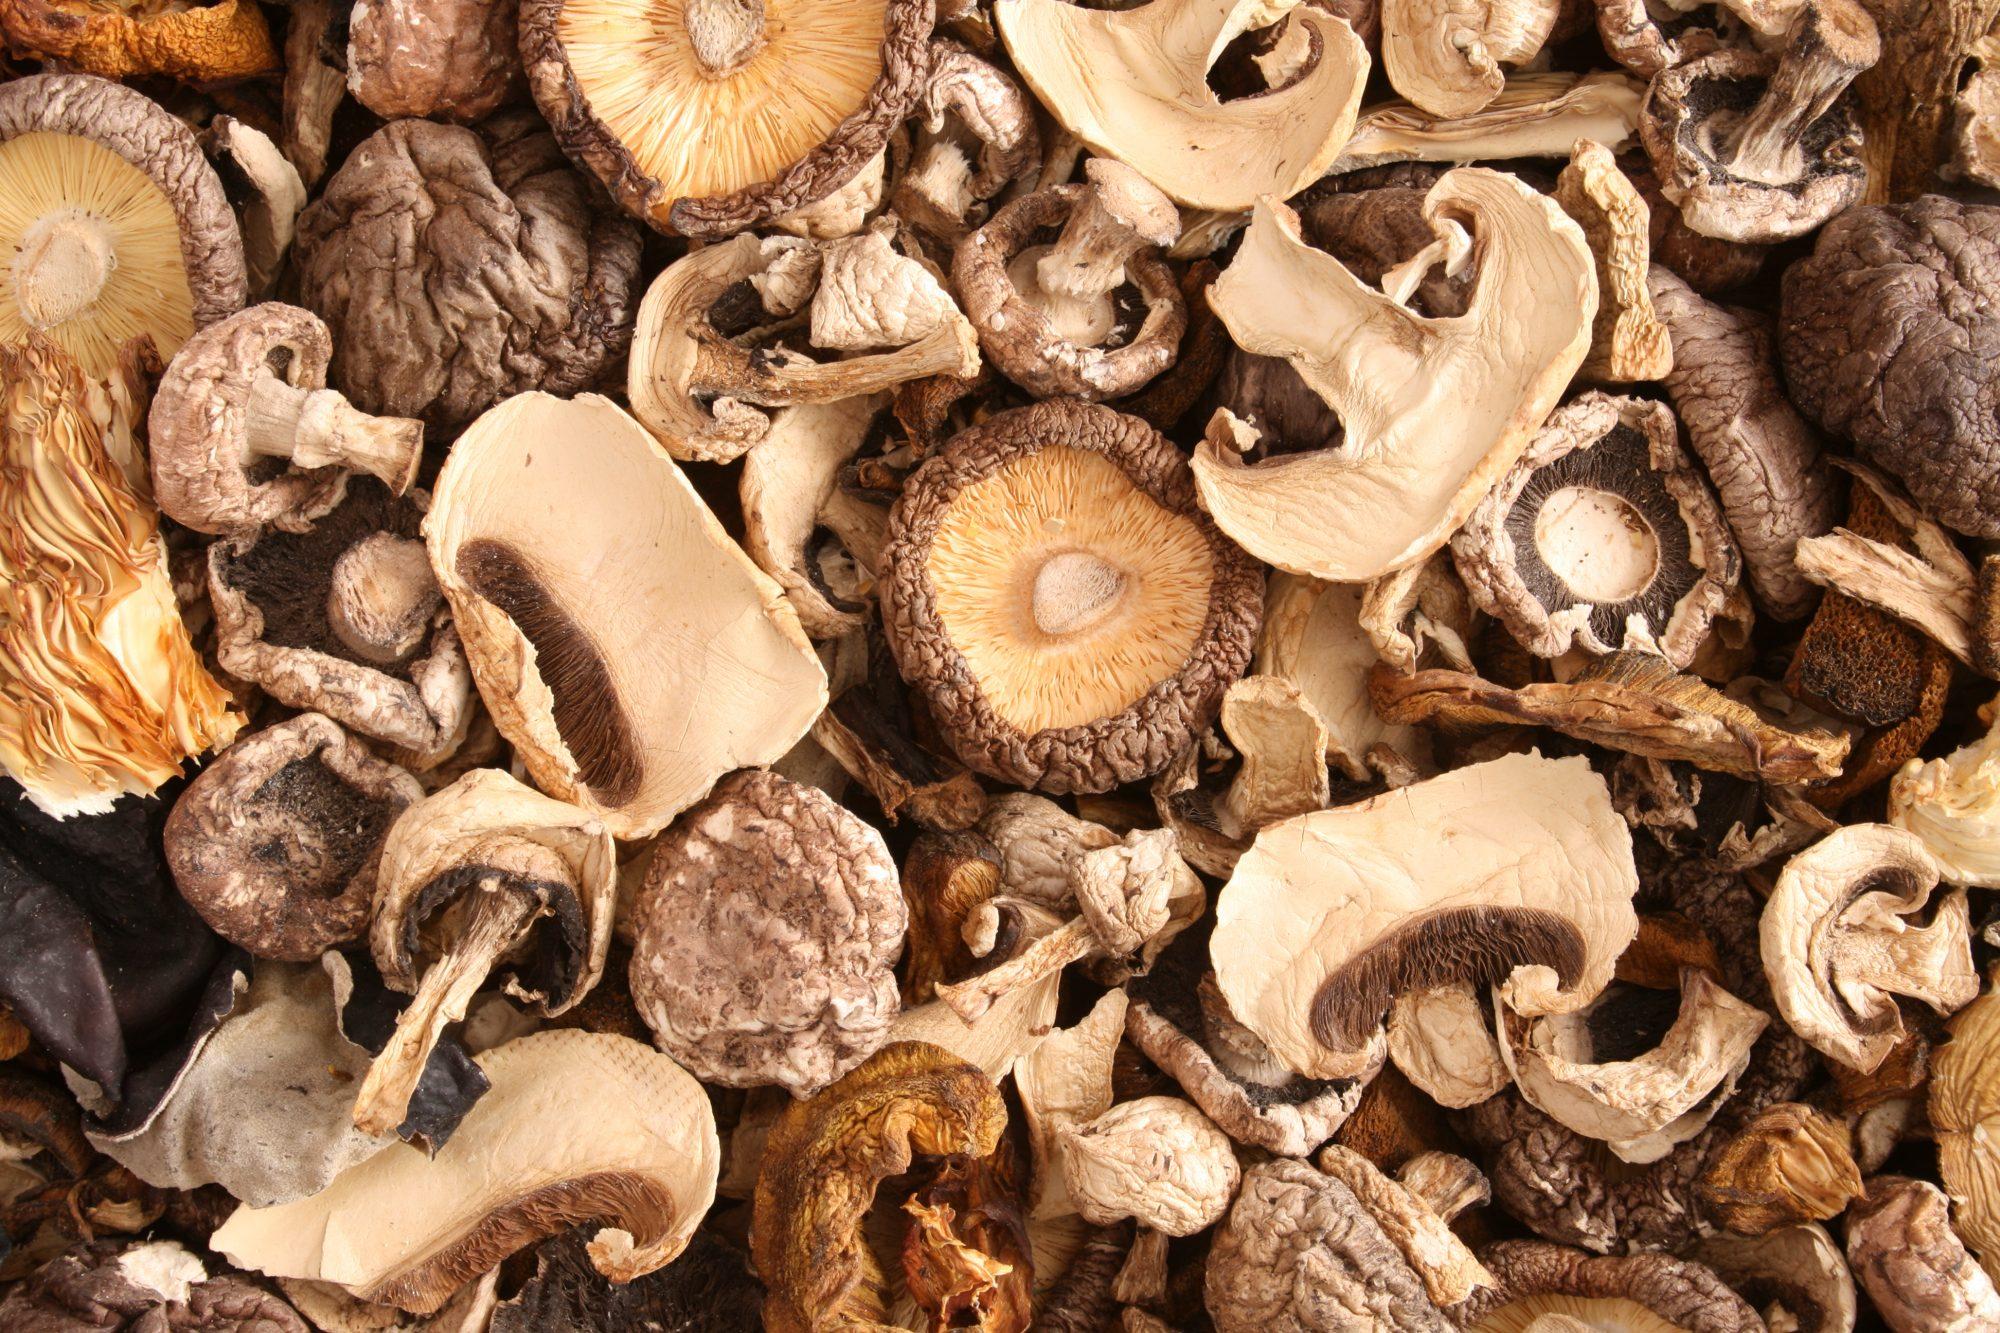 090120_Dried Mushrooms